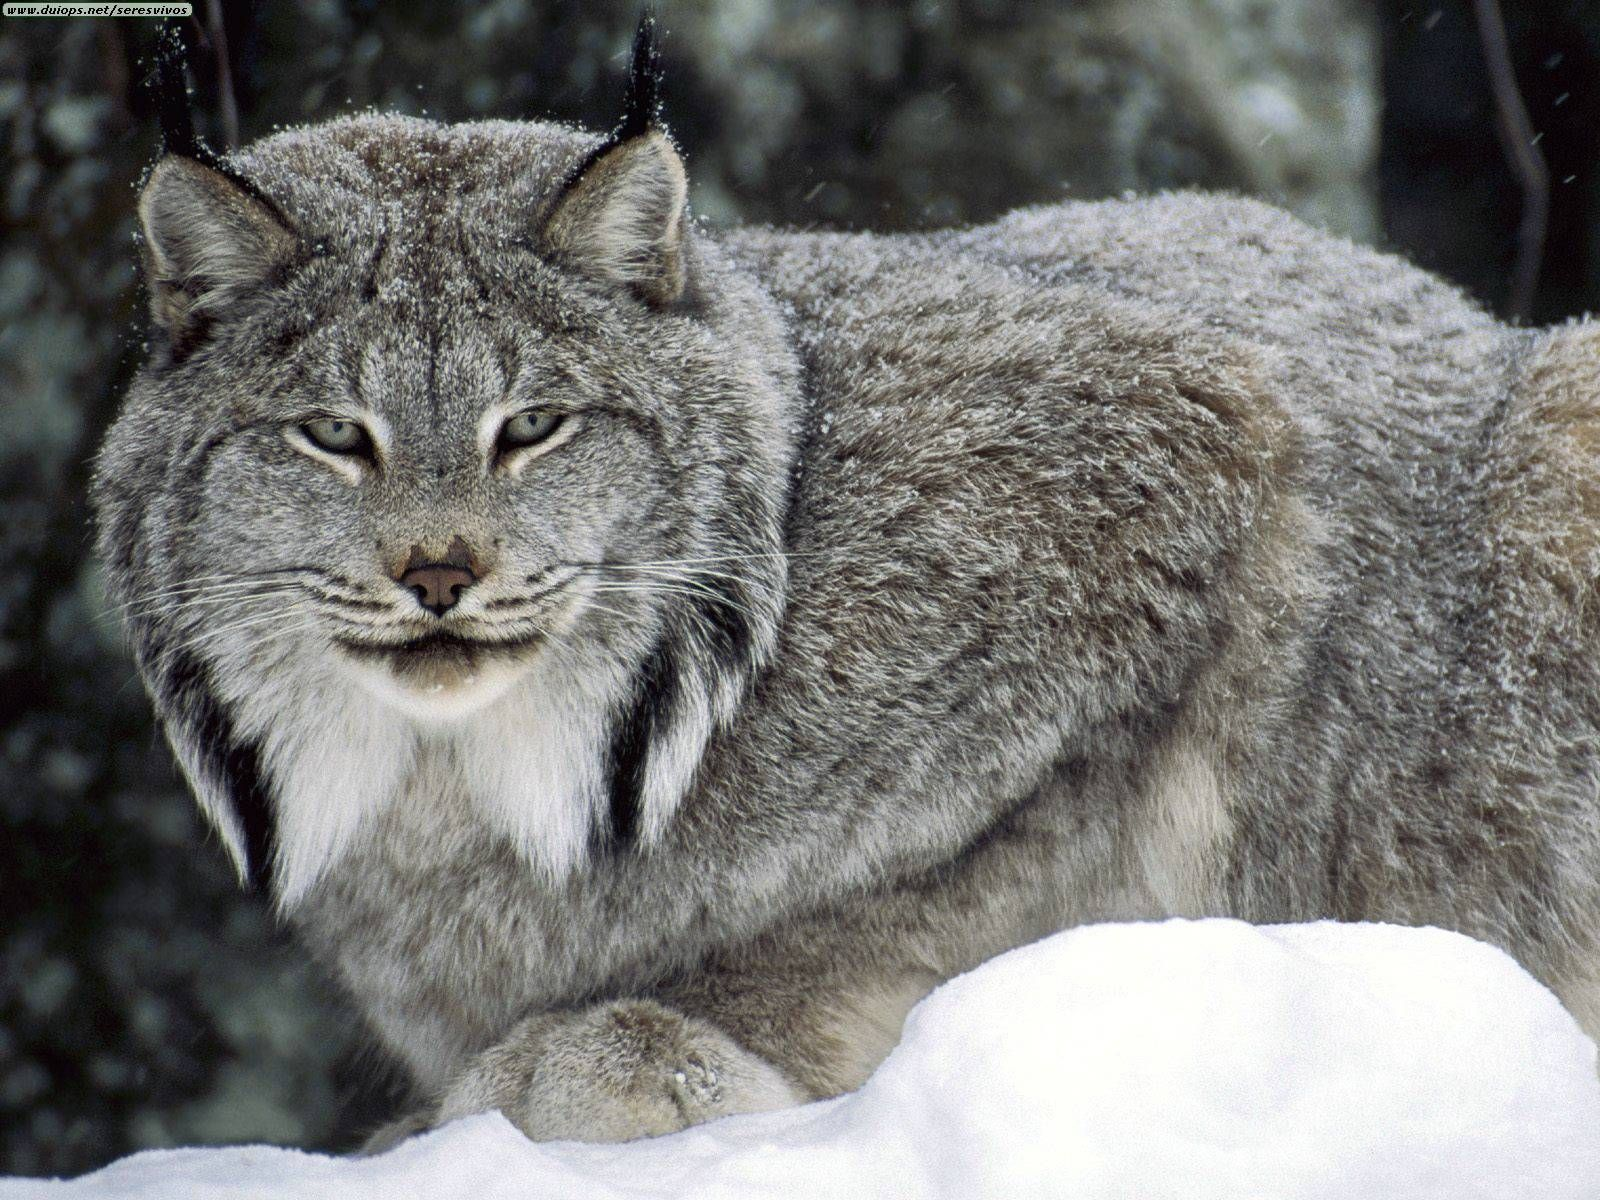 Worksheet. Unusual animals around the world  Lynx Canada lynx and Short legs